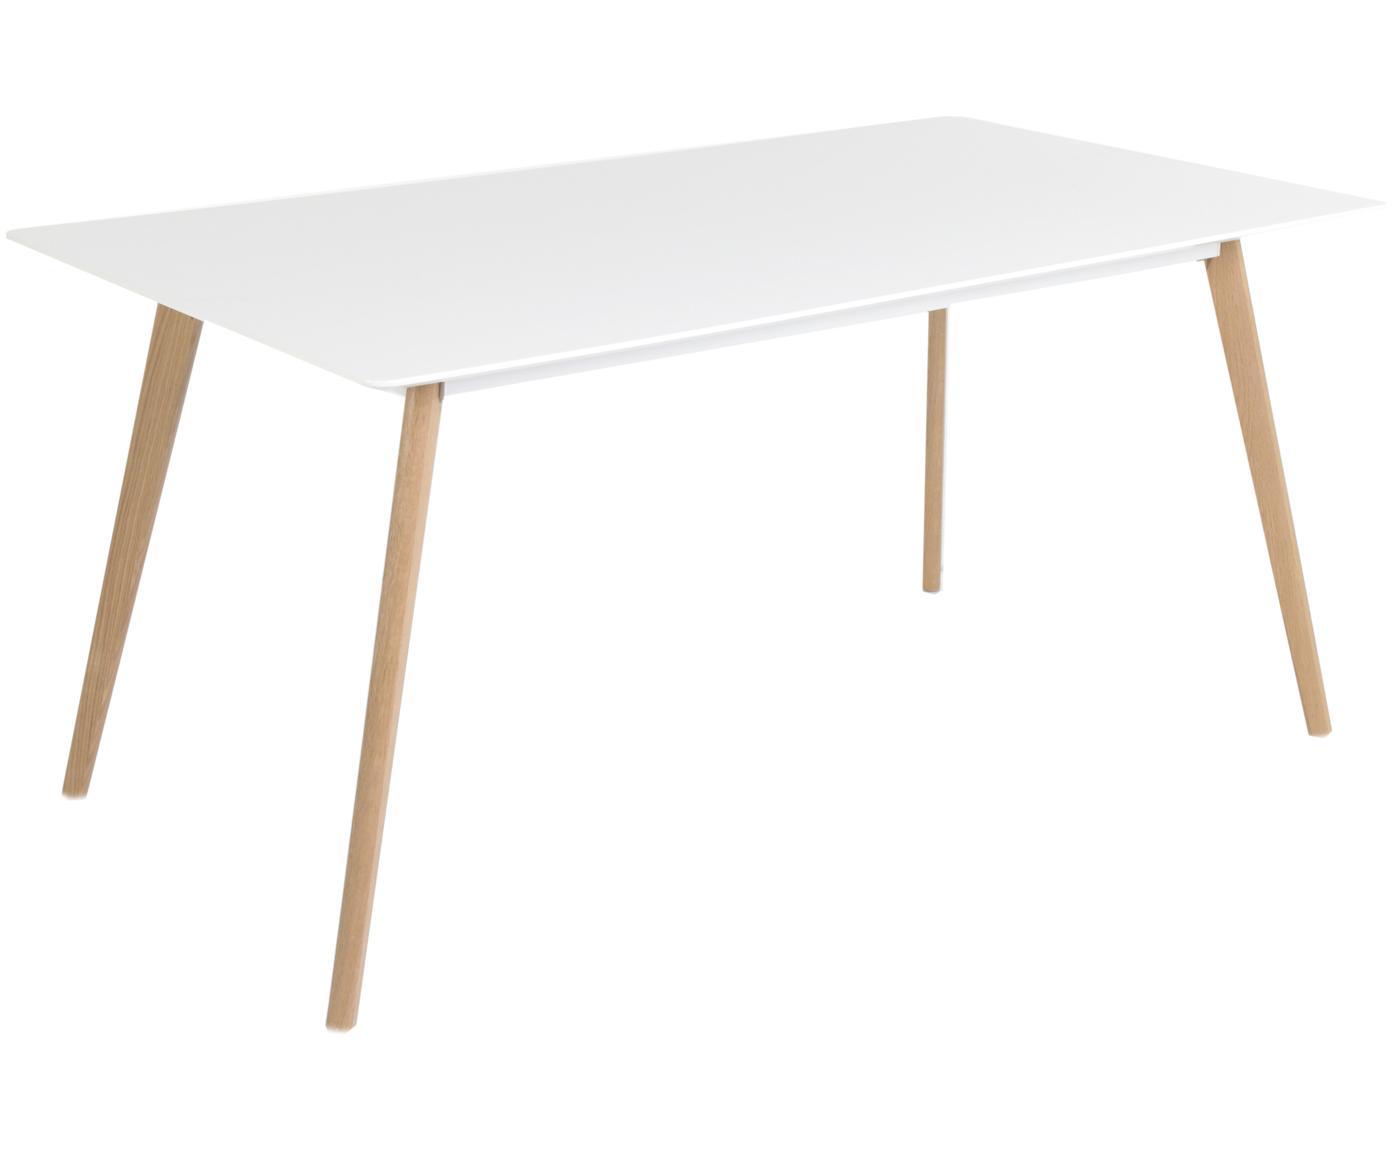 Eettafel Flamy, Tafelblad: mat gelakt MDF, Poten: geolied eikenhout, Wit, eikenhoutkleurig, B 160 x D 90 cm